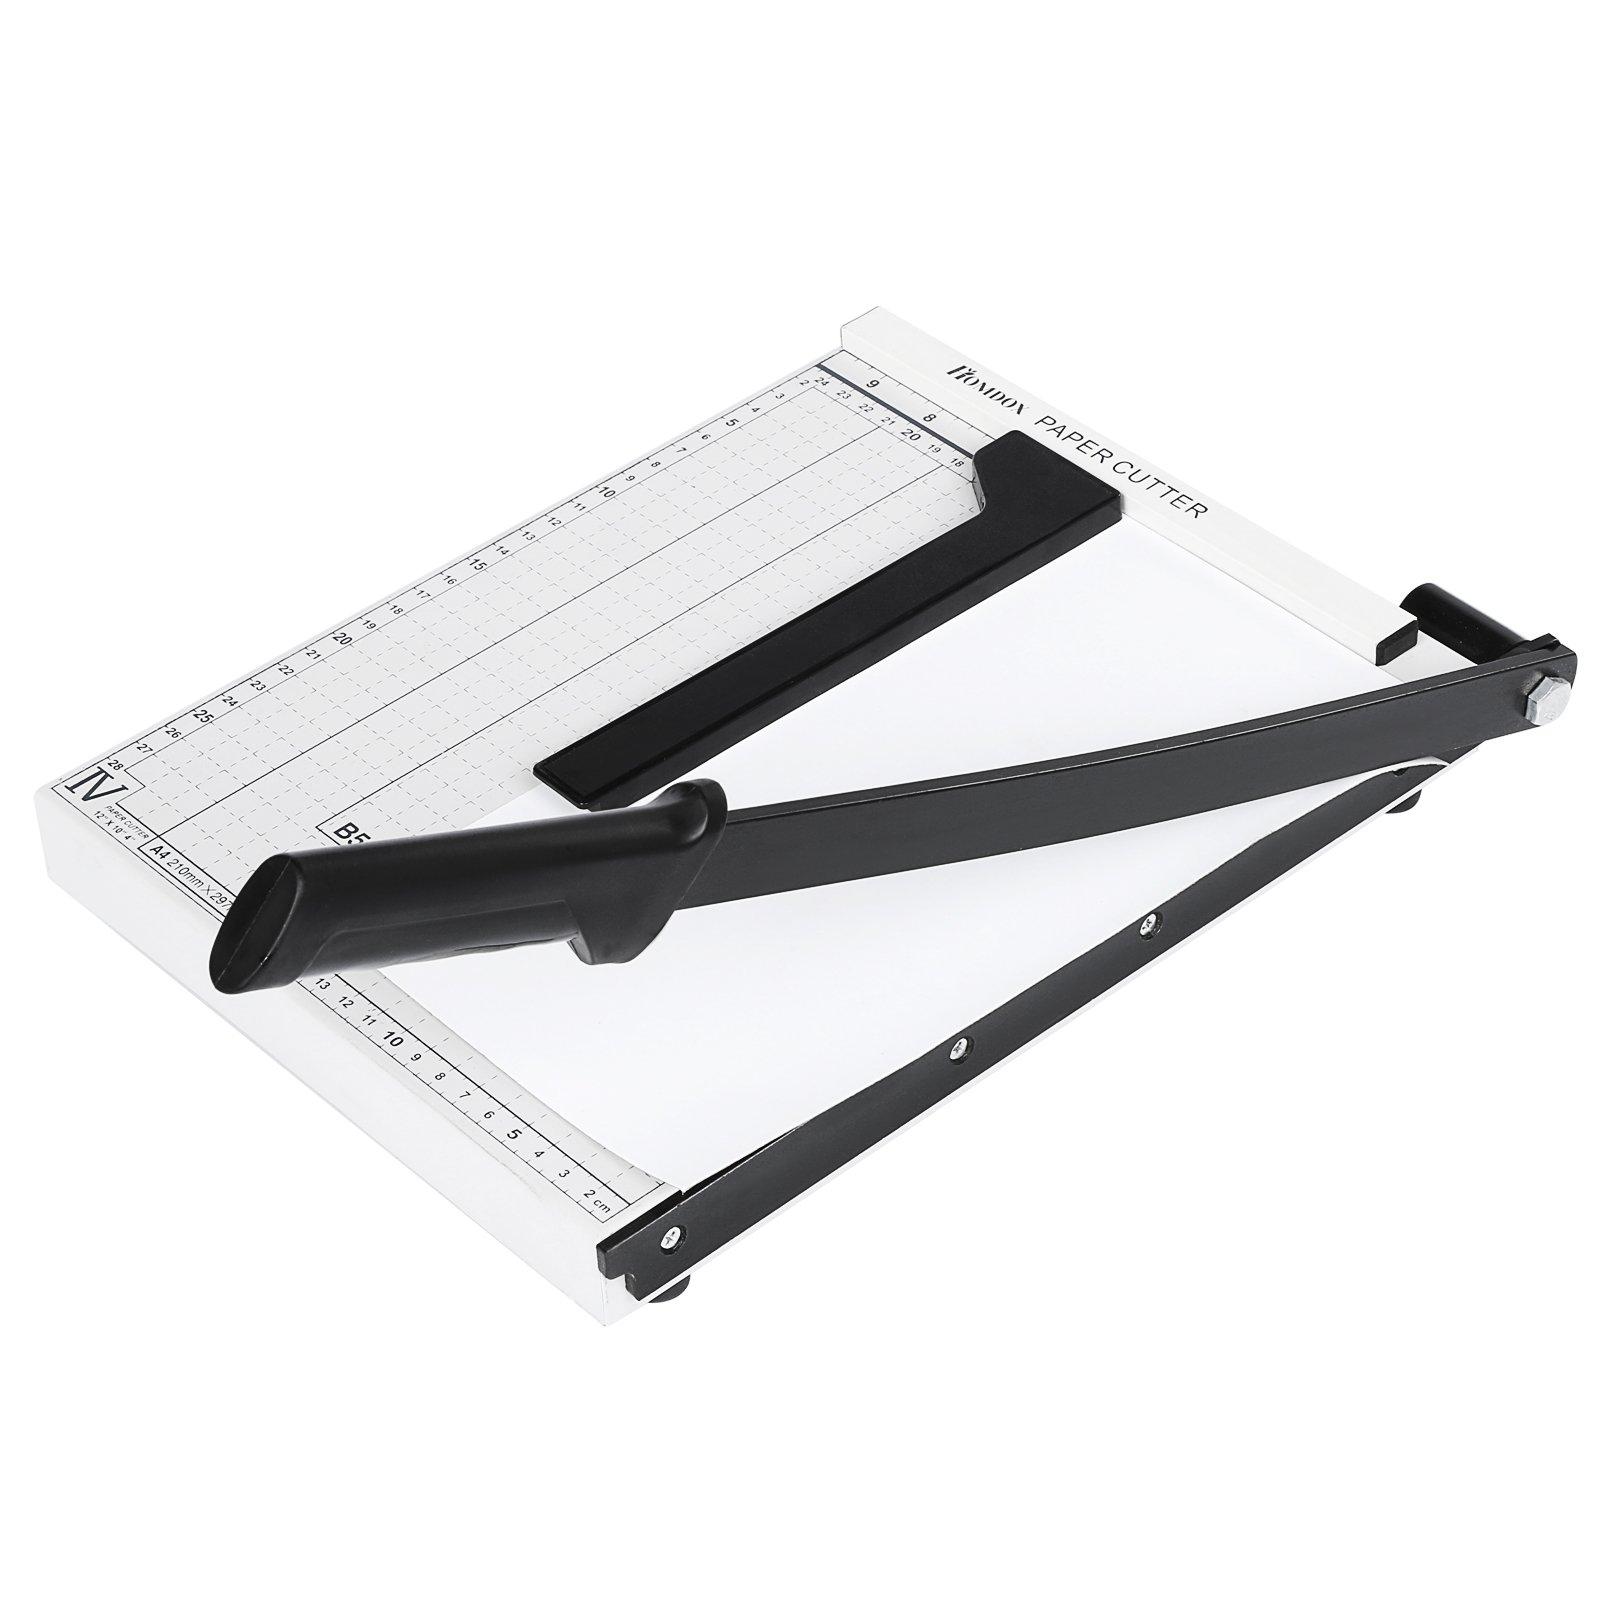 shaofu Paper Trimmer/Cutter, Guillotine, Durable Plastic Base, 10 Sheets Capacity, ClassicCut Lite (White)